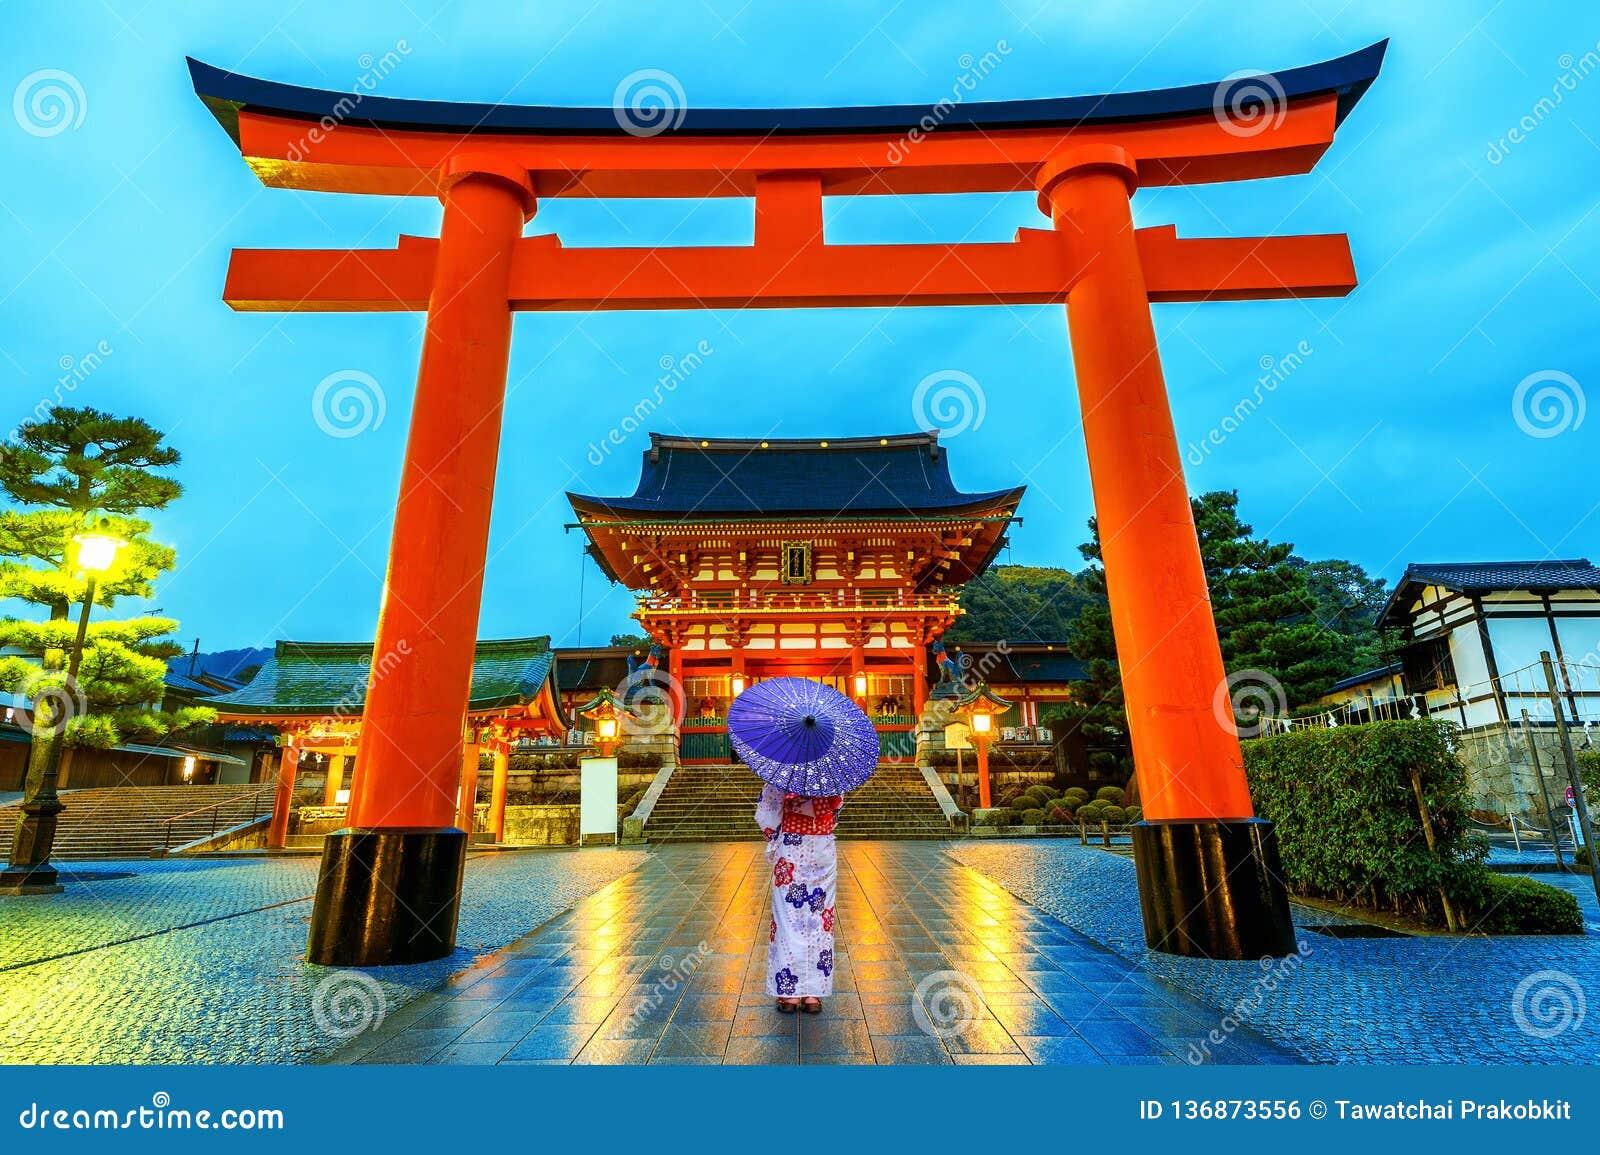 Asian women in traditional japanese kimonos at Fushimi Inari Shrine in Kyoto, Japan